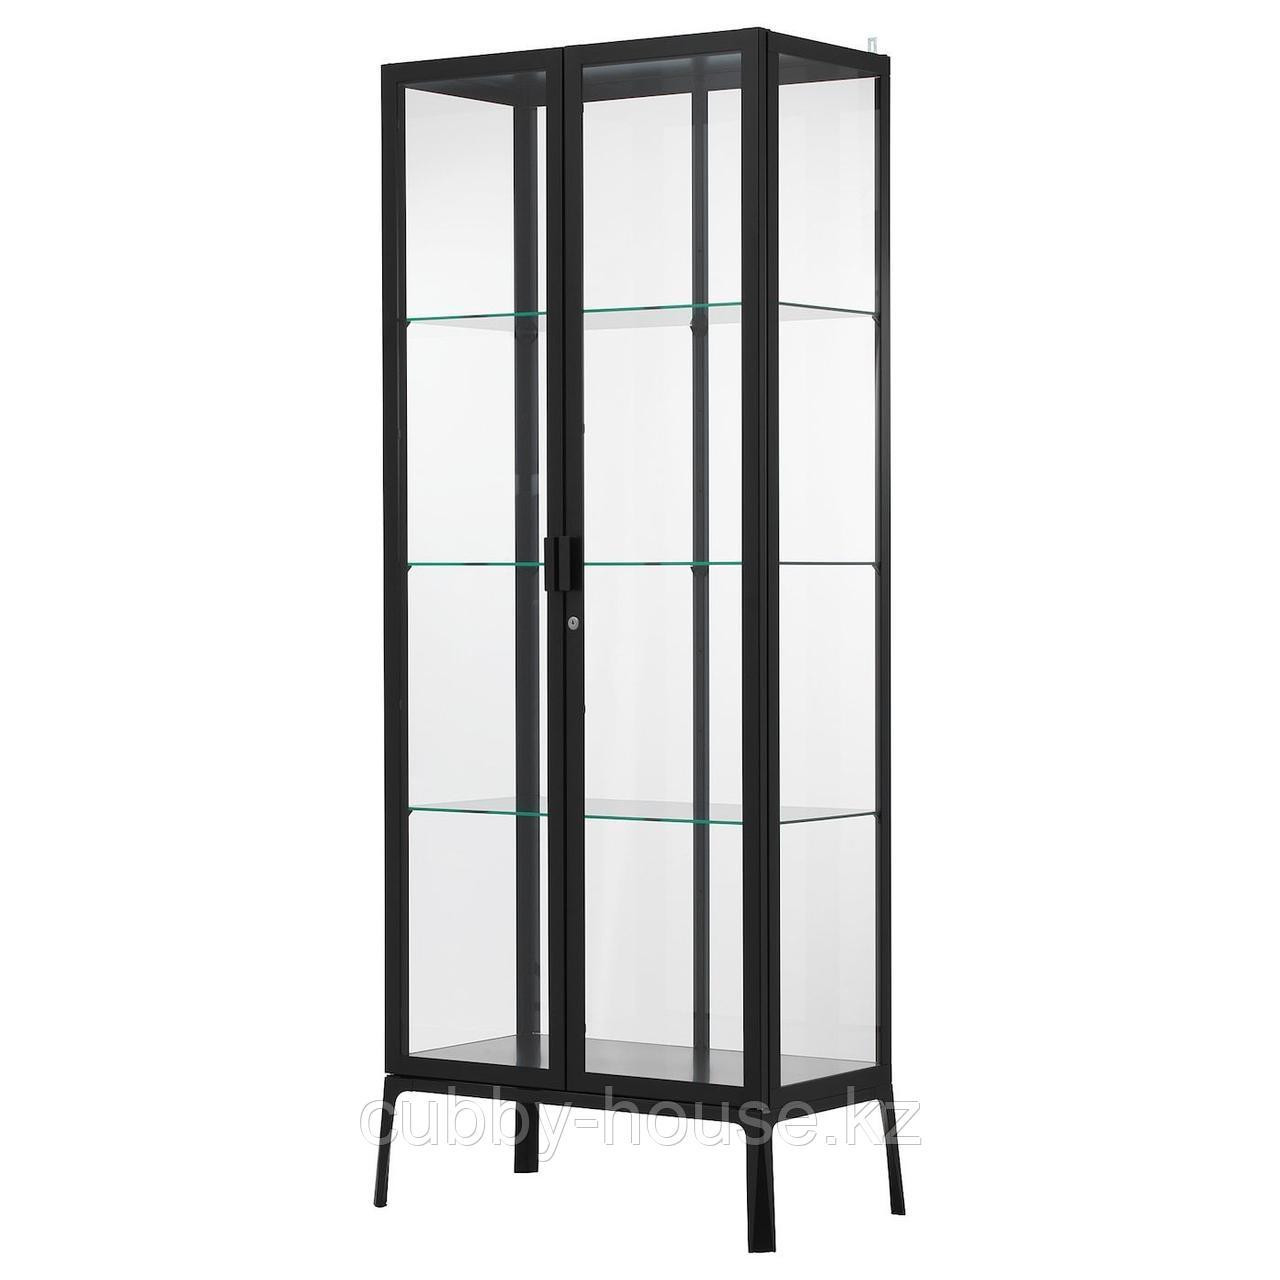 МИЛЬСБУ Шкаф-витрина, антрацит, 73x175 см